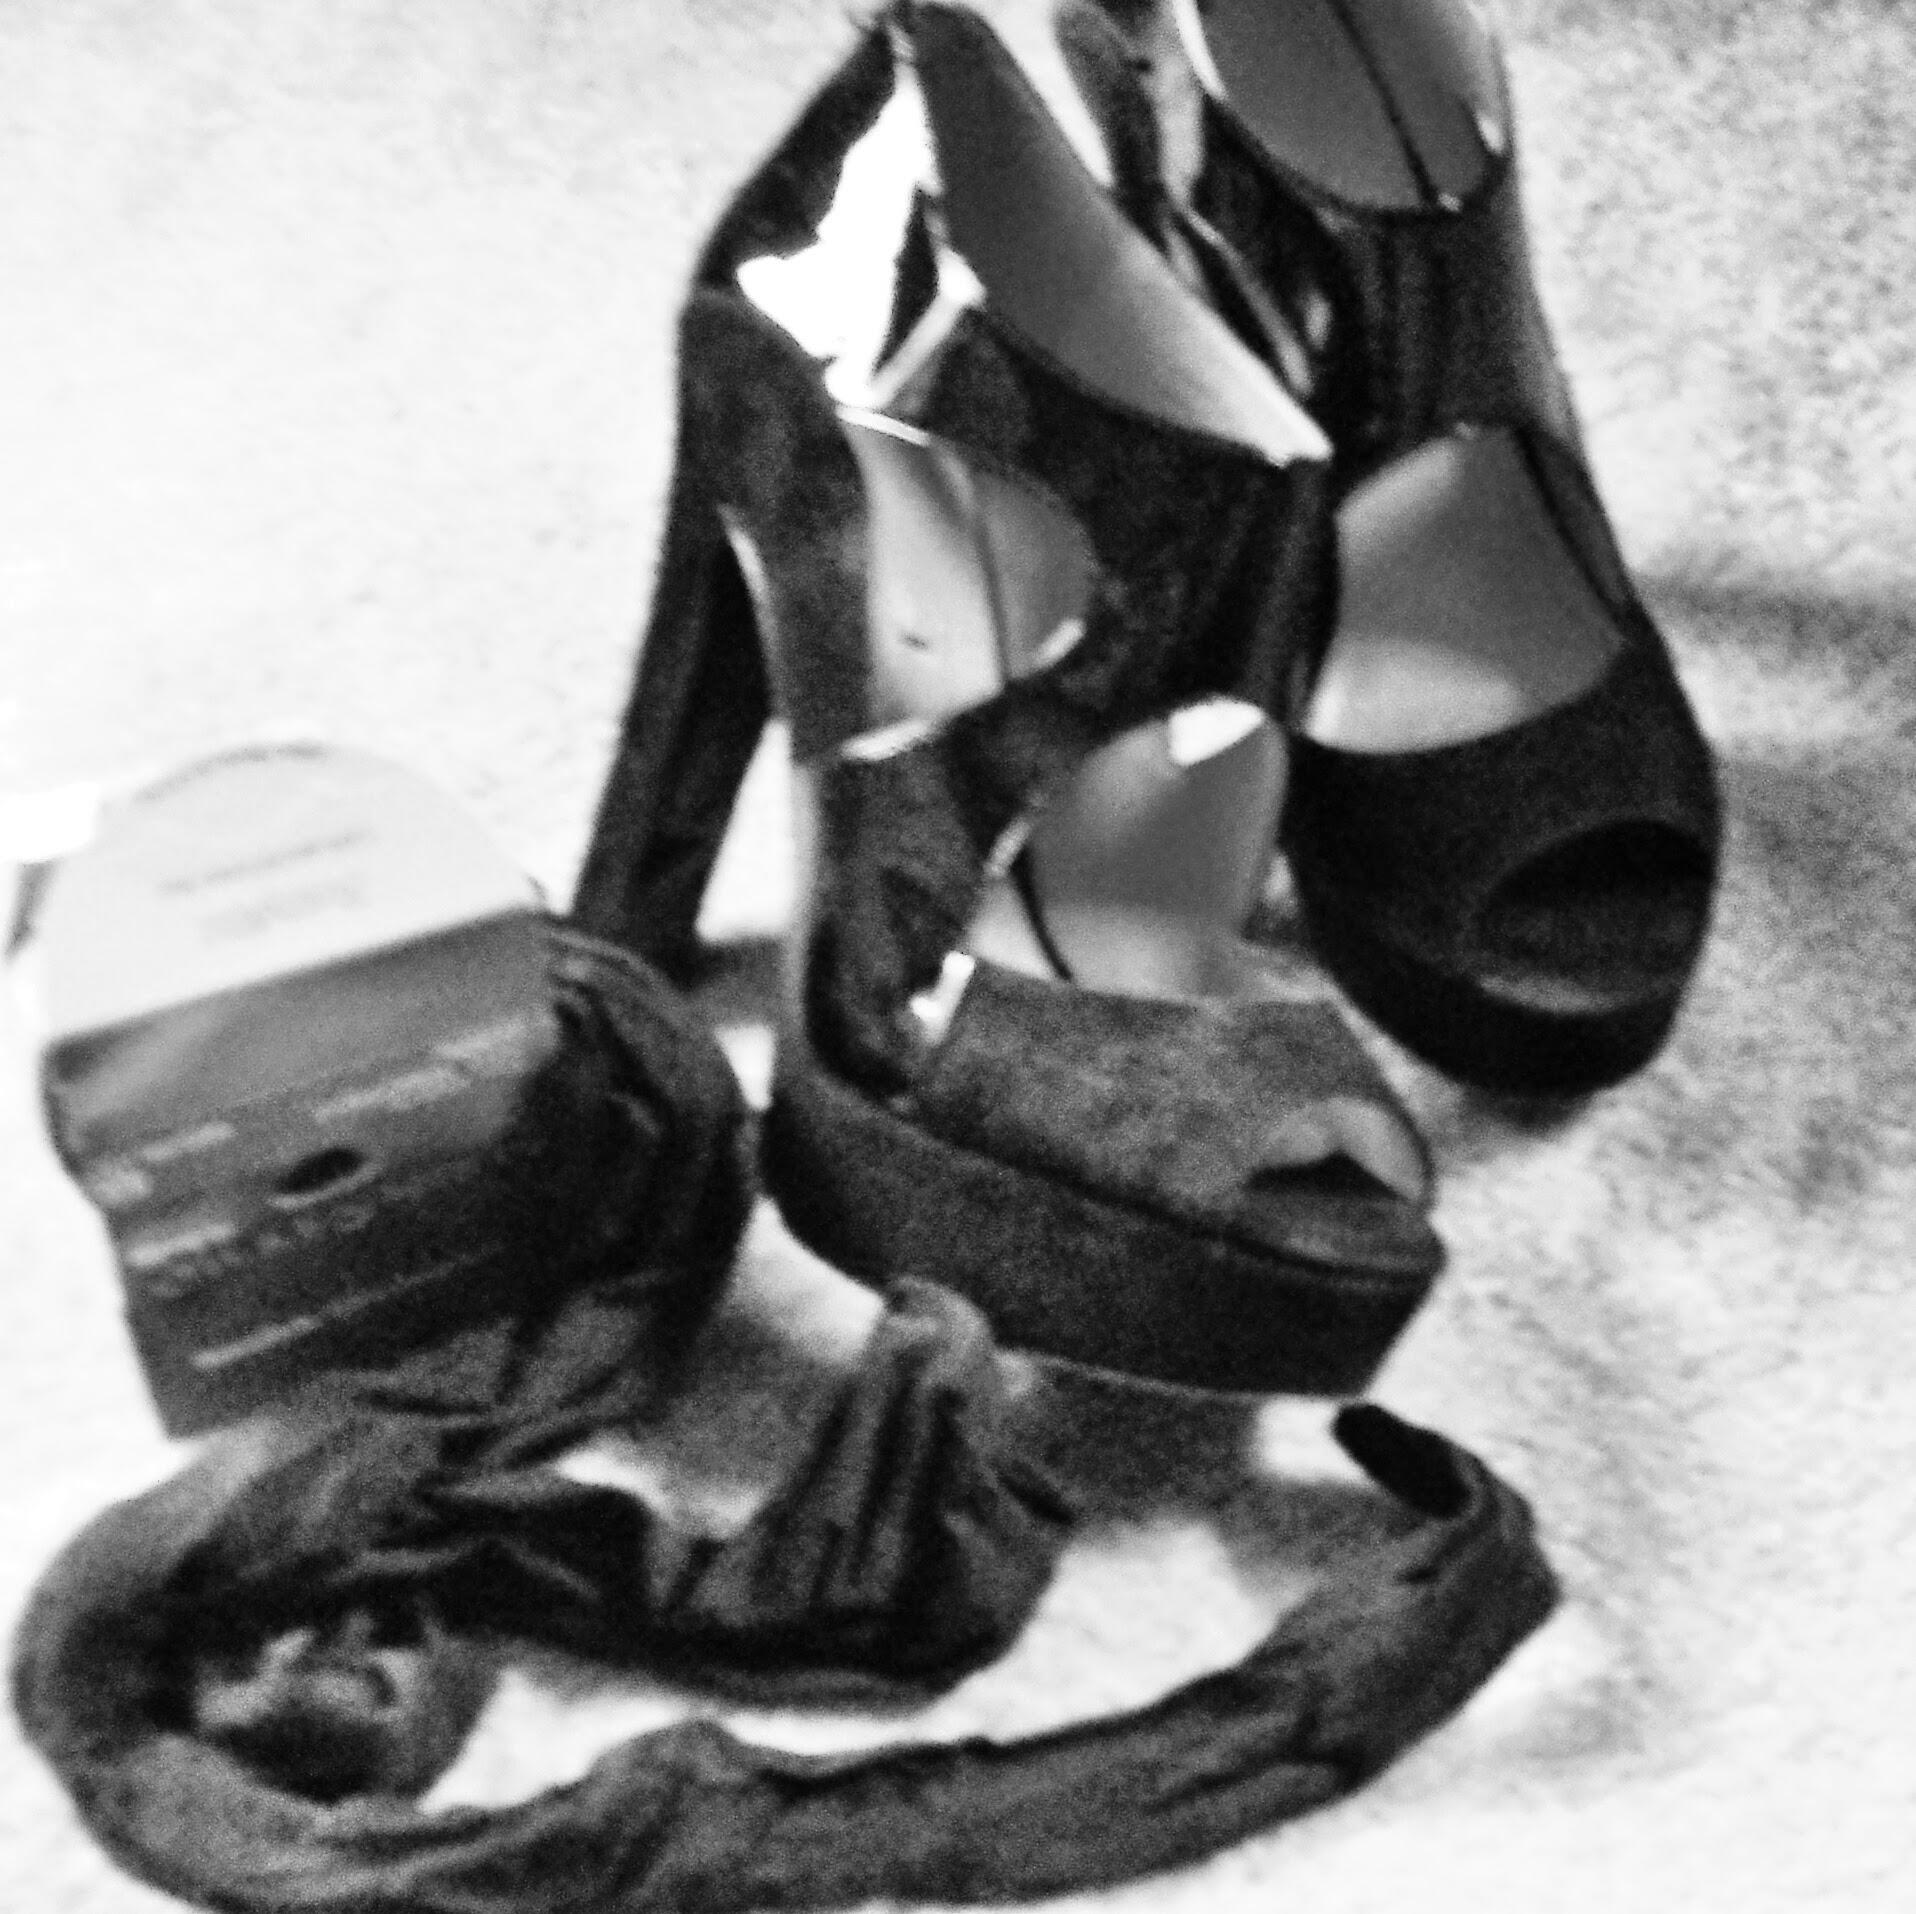 Black Shoes Black Tights...